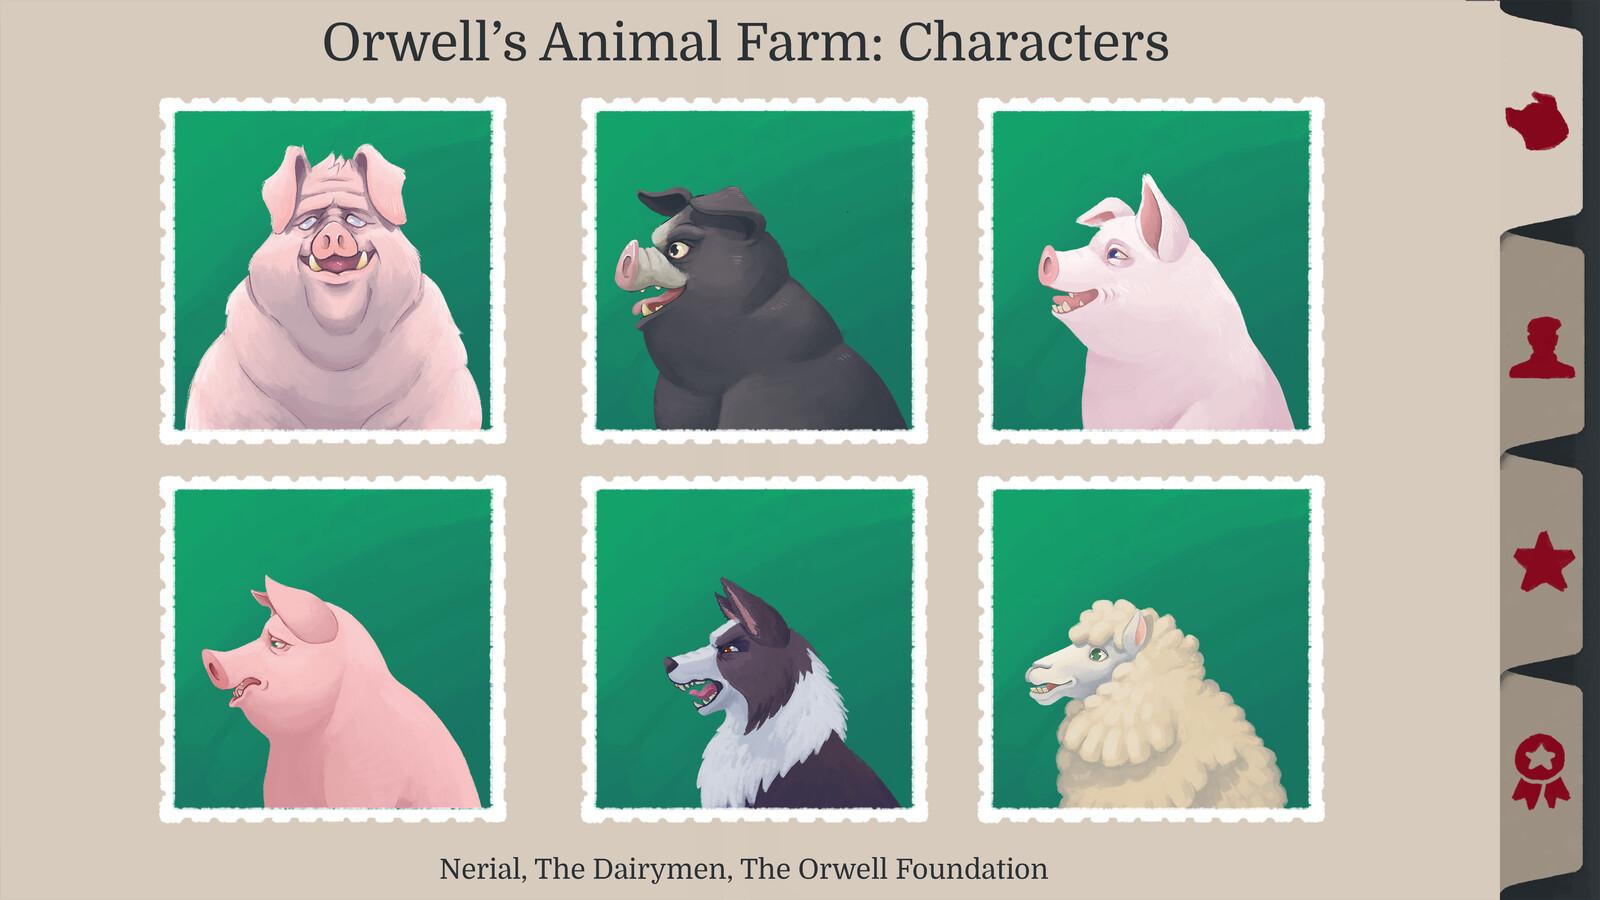 Orwell's Animal Farm: Characters